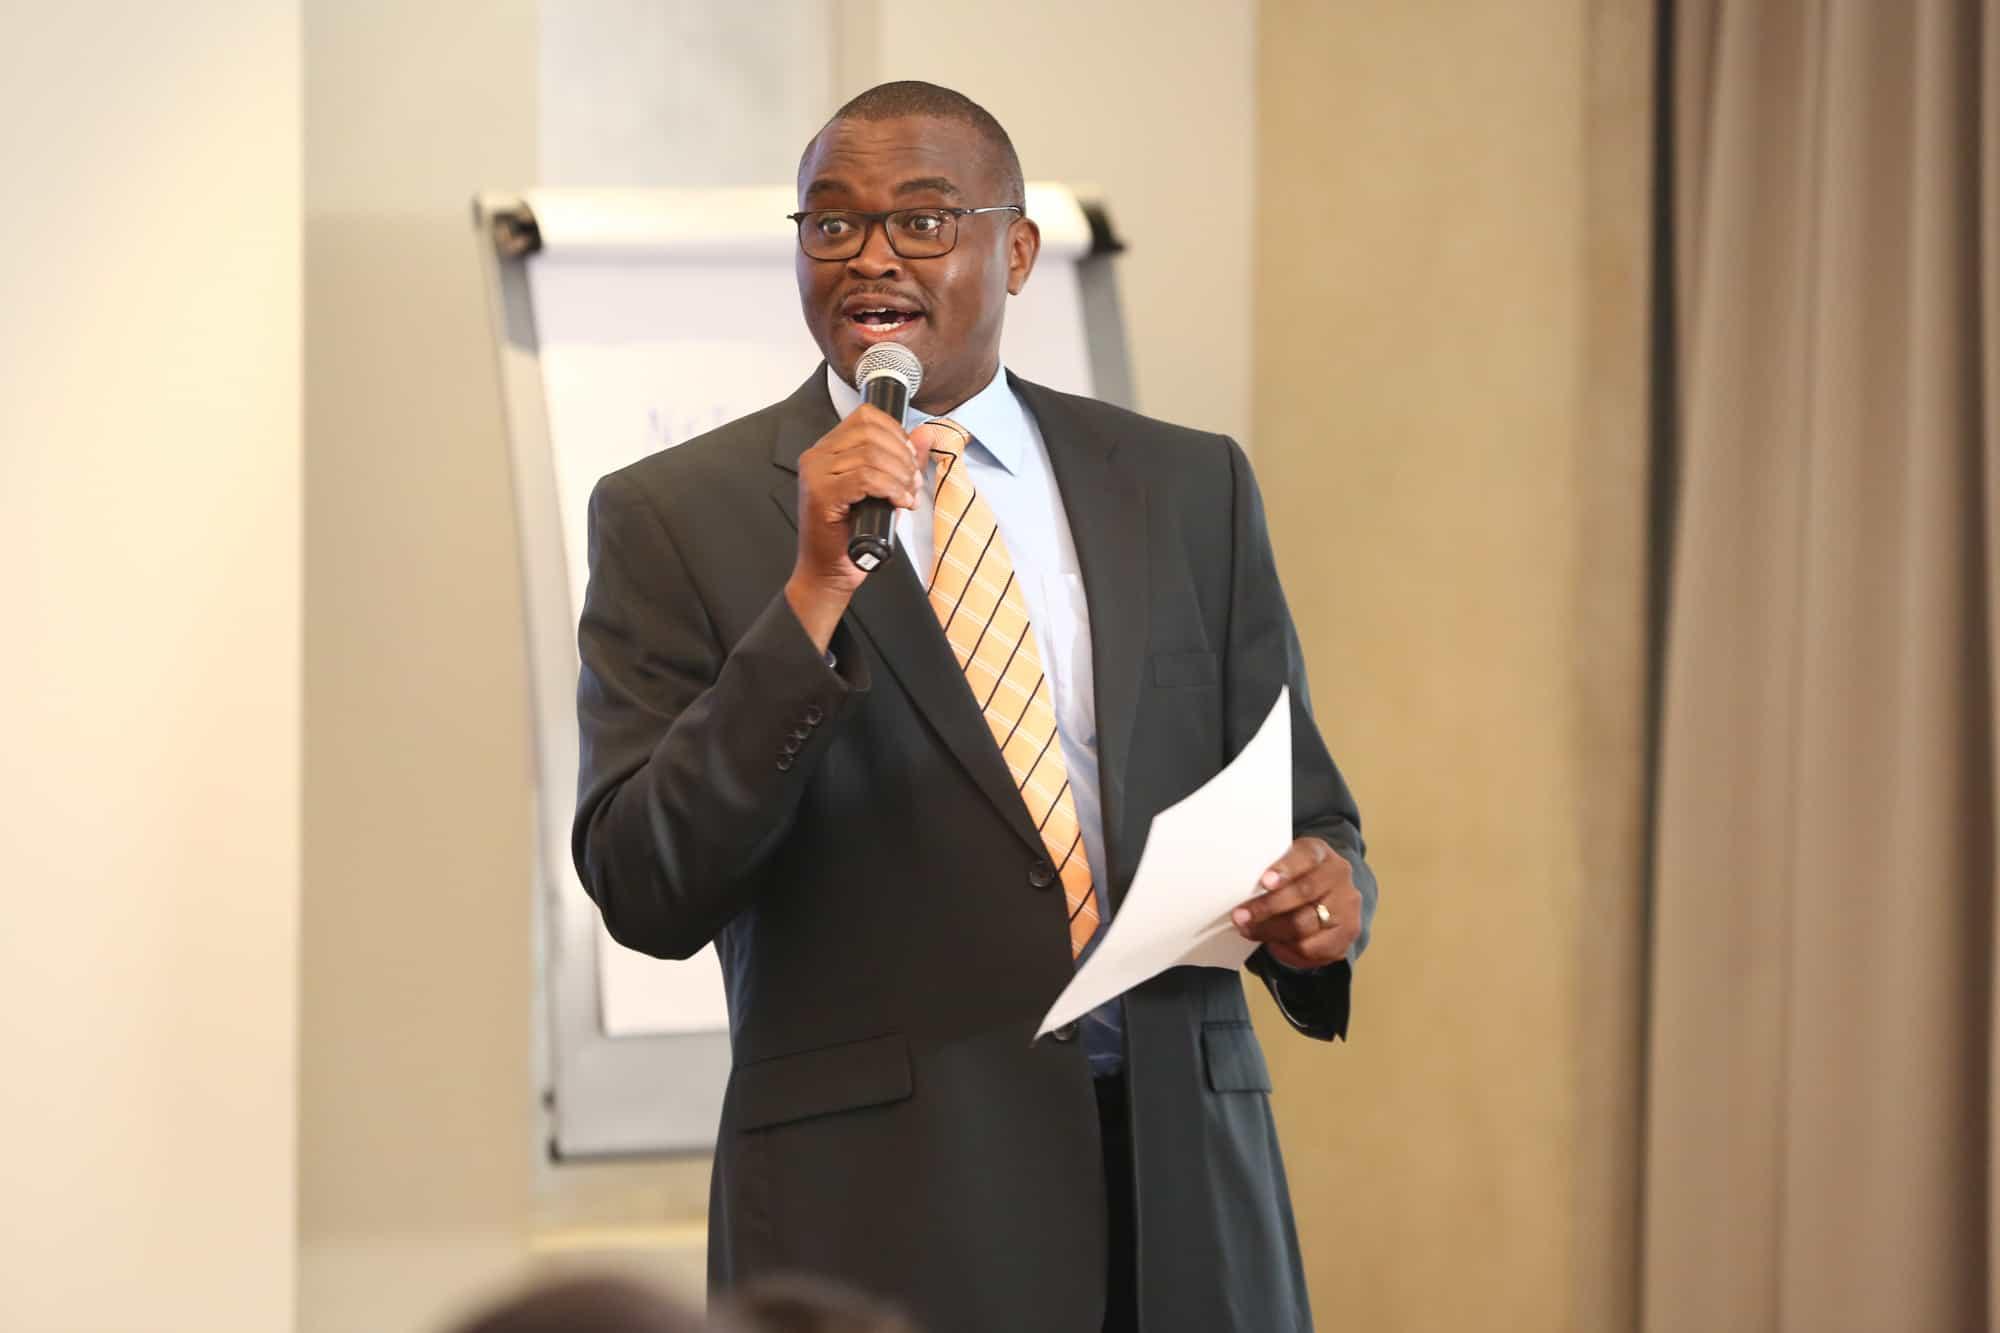 Geoffrey Shimanyula, Chief Commercial Officer at Liquid Telecom Kenya on Africa abandoning Internet Satellite status